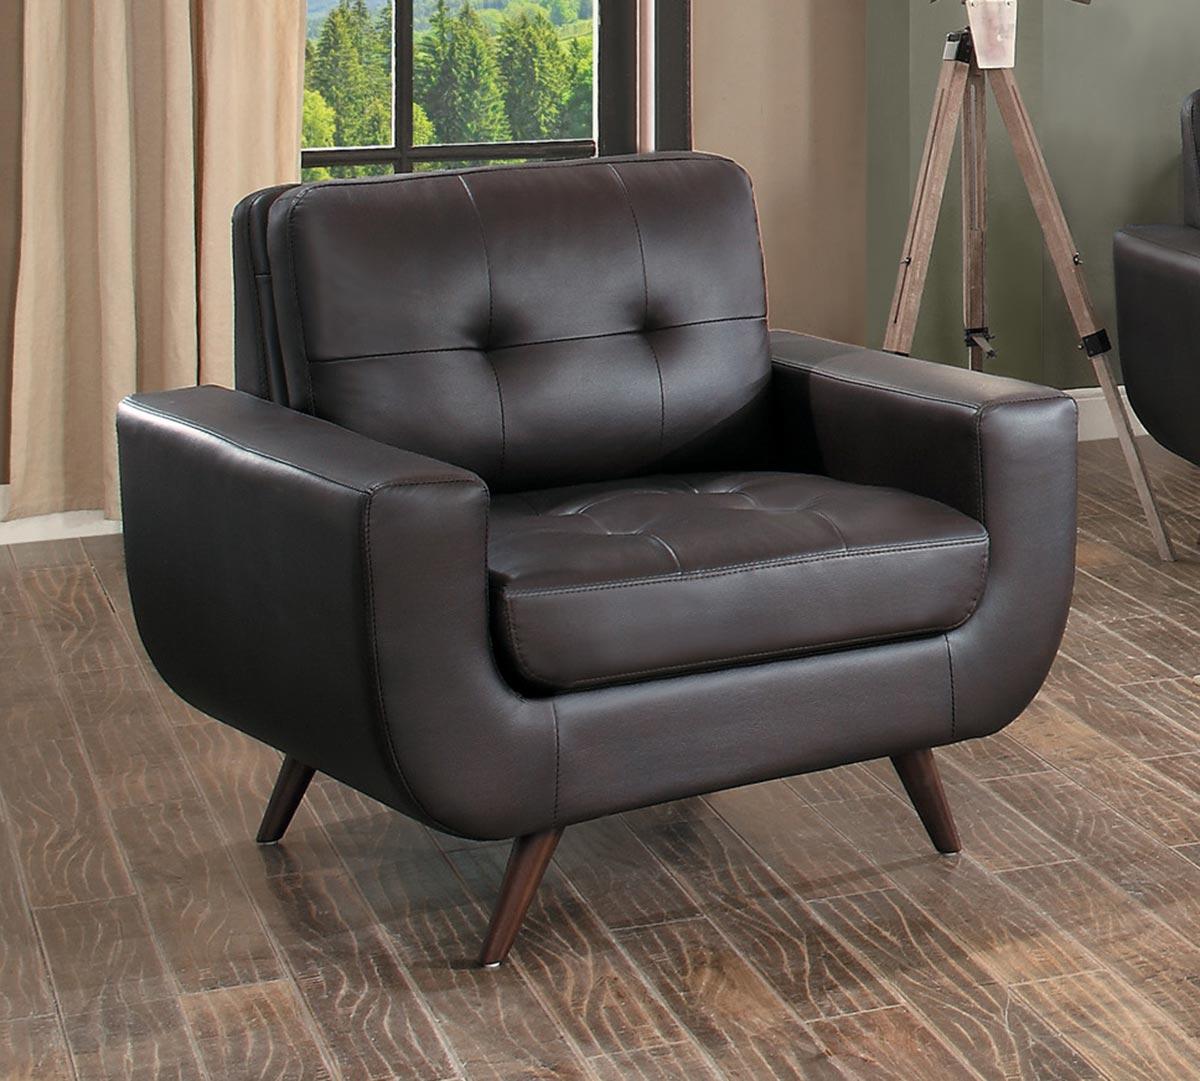 Homelegance Deryn Chair - Dark Brown